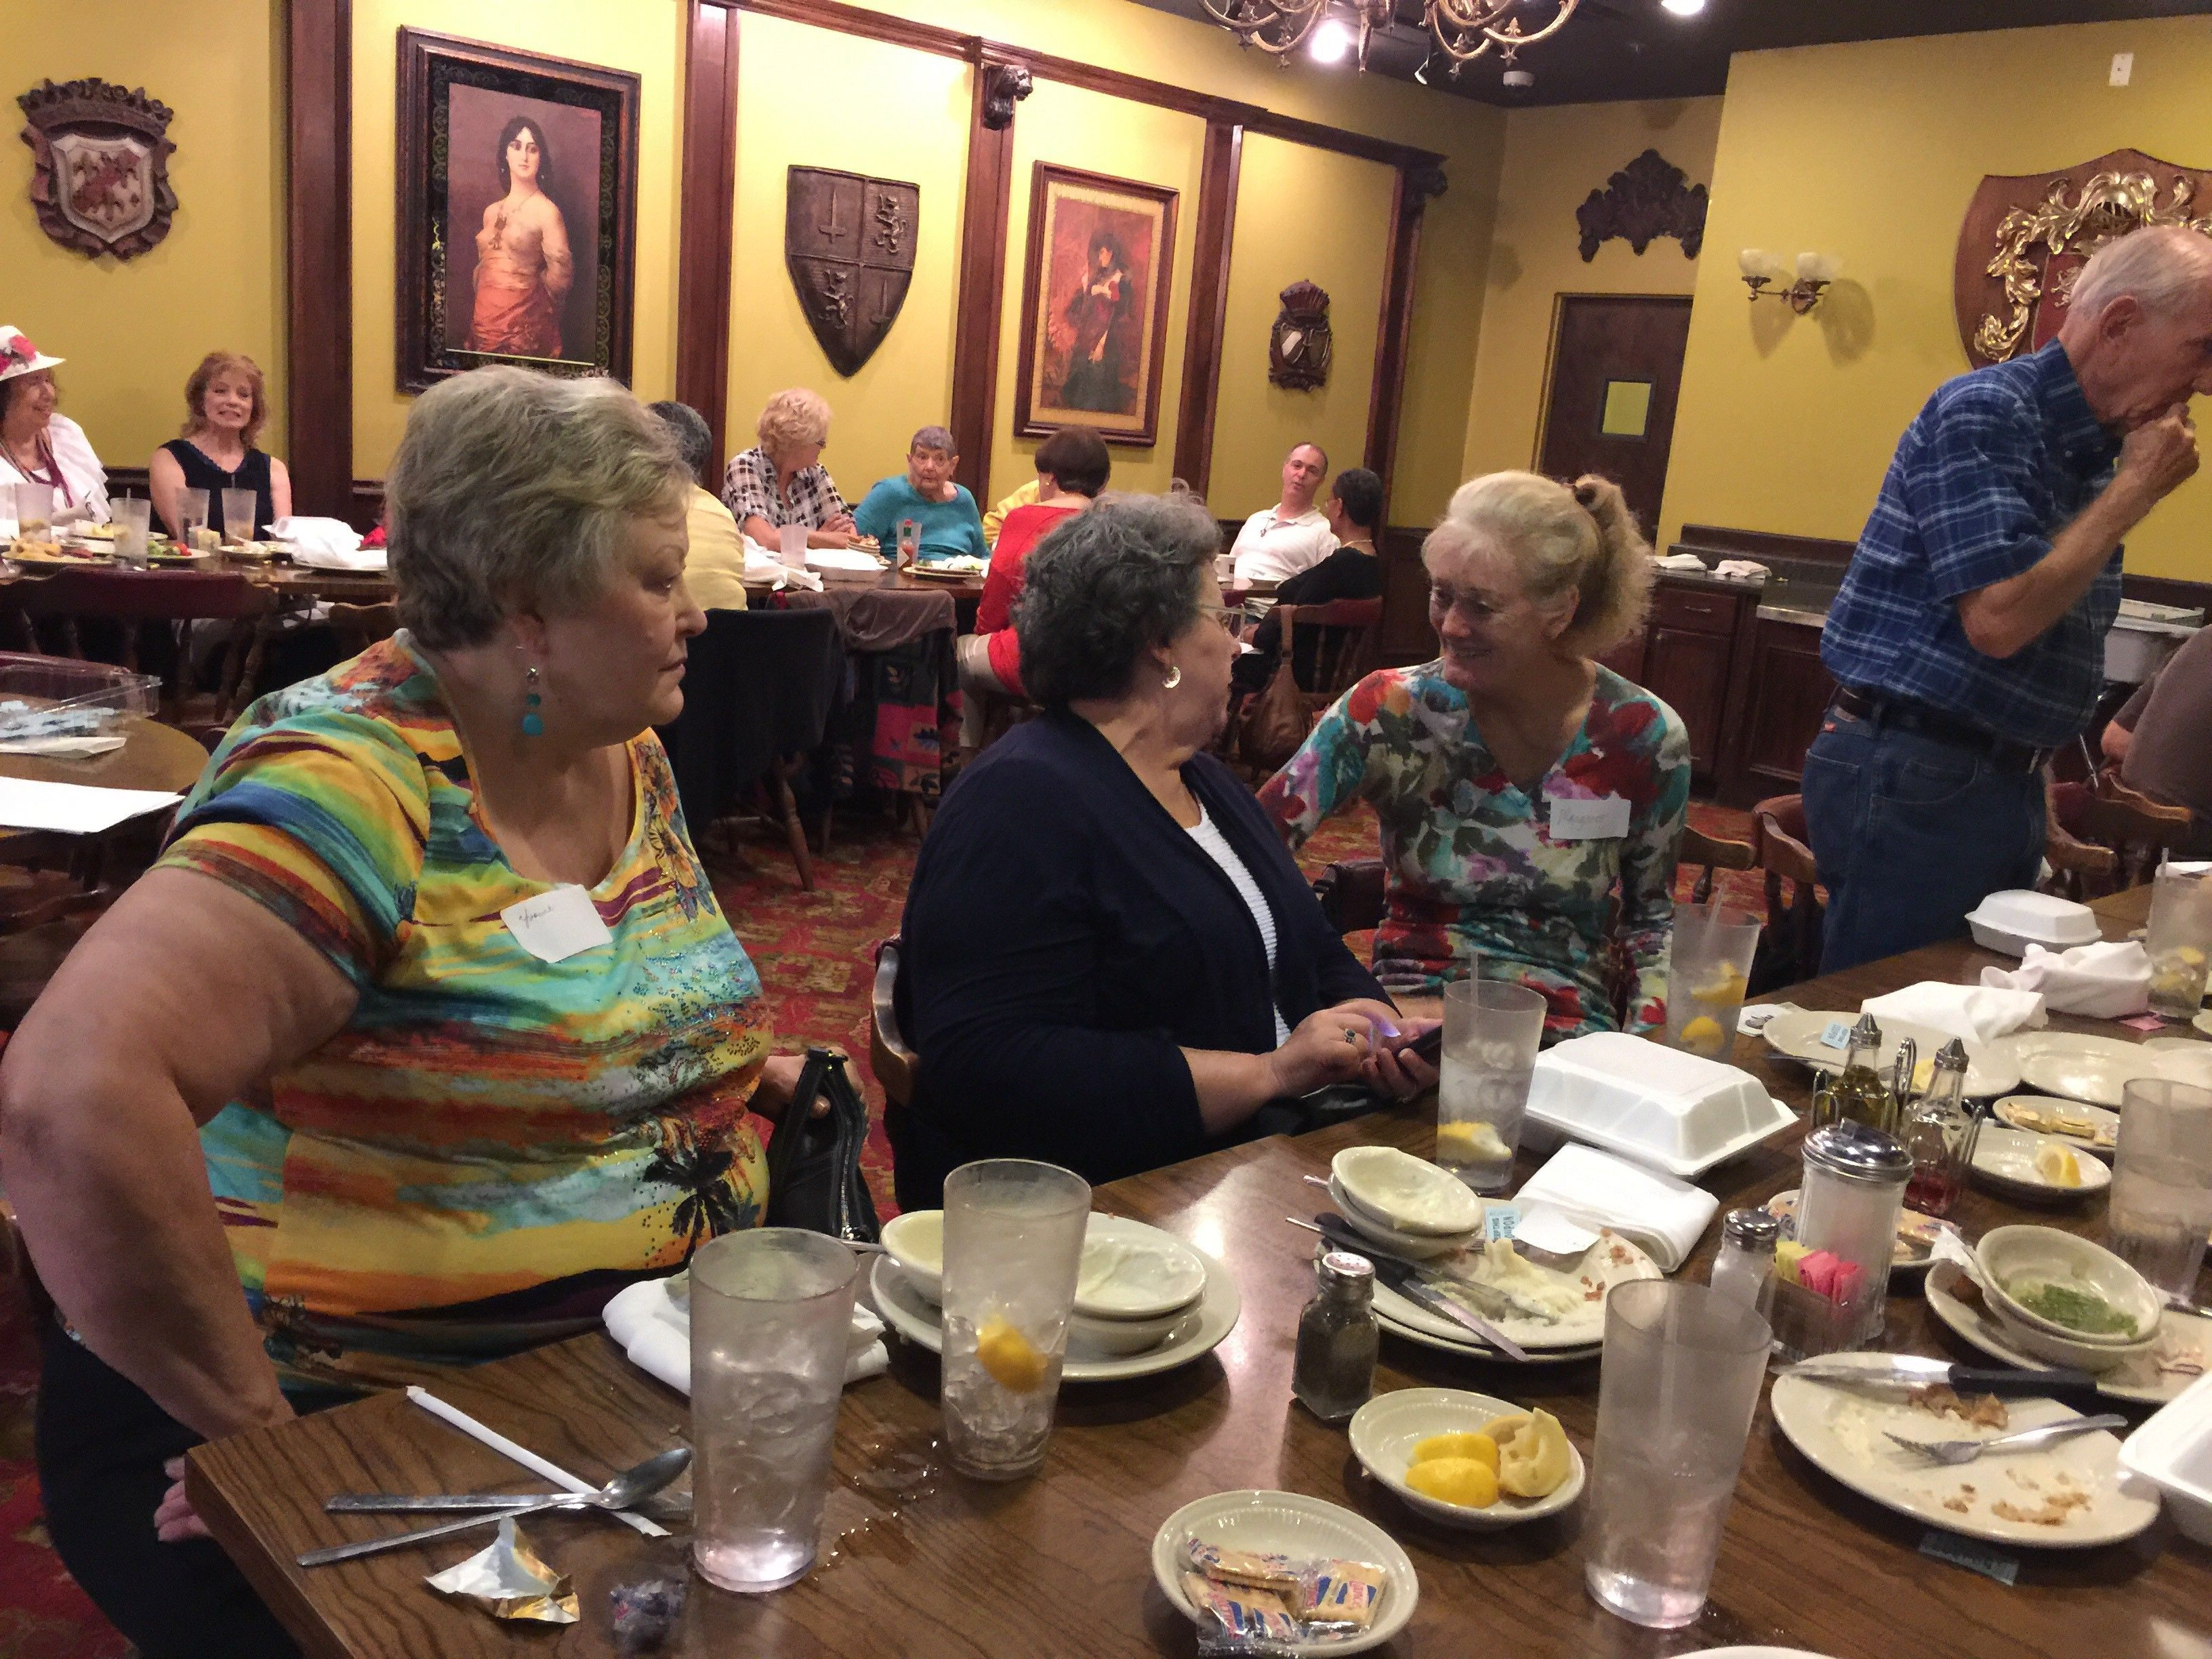 San antonio singles groups Singles groups in San Antonio - Meetup